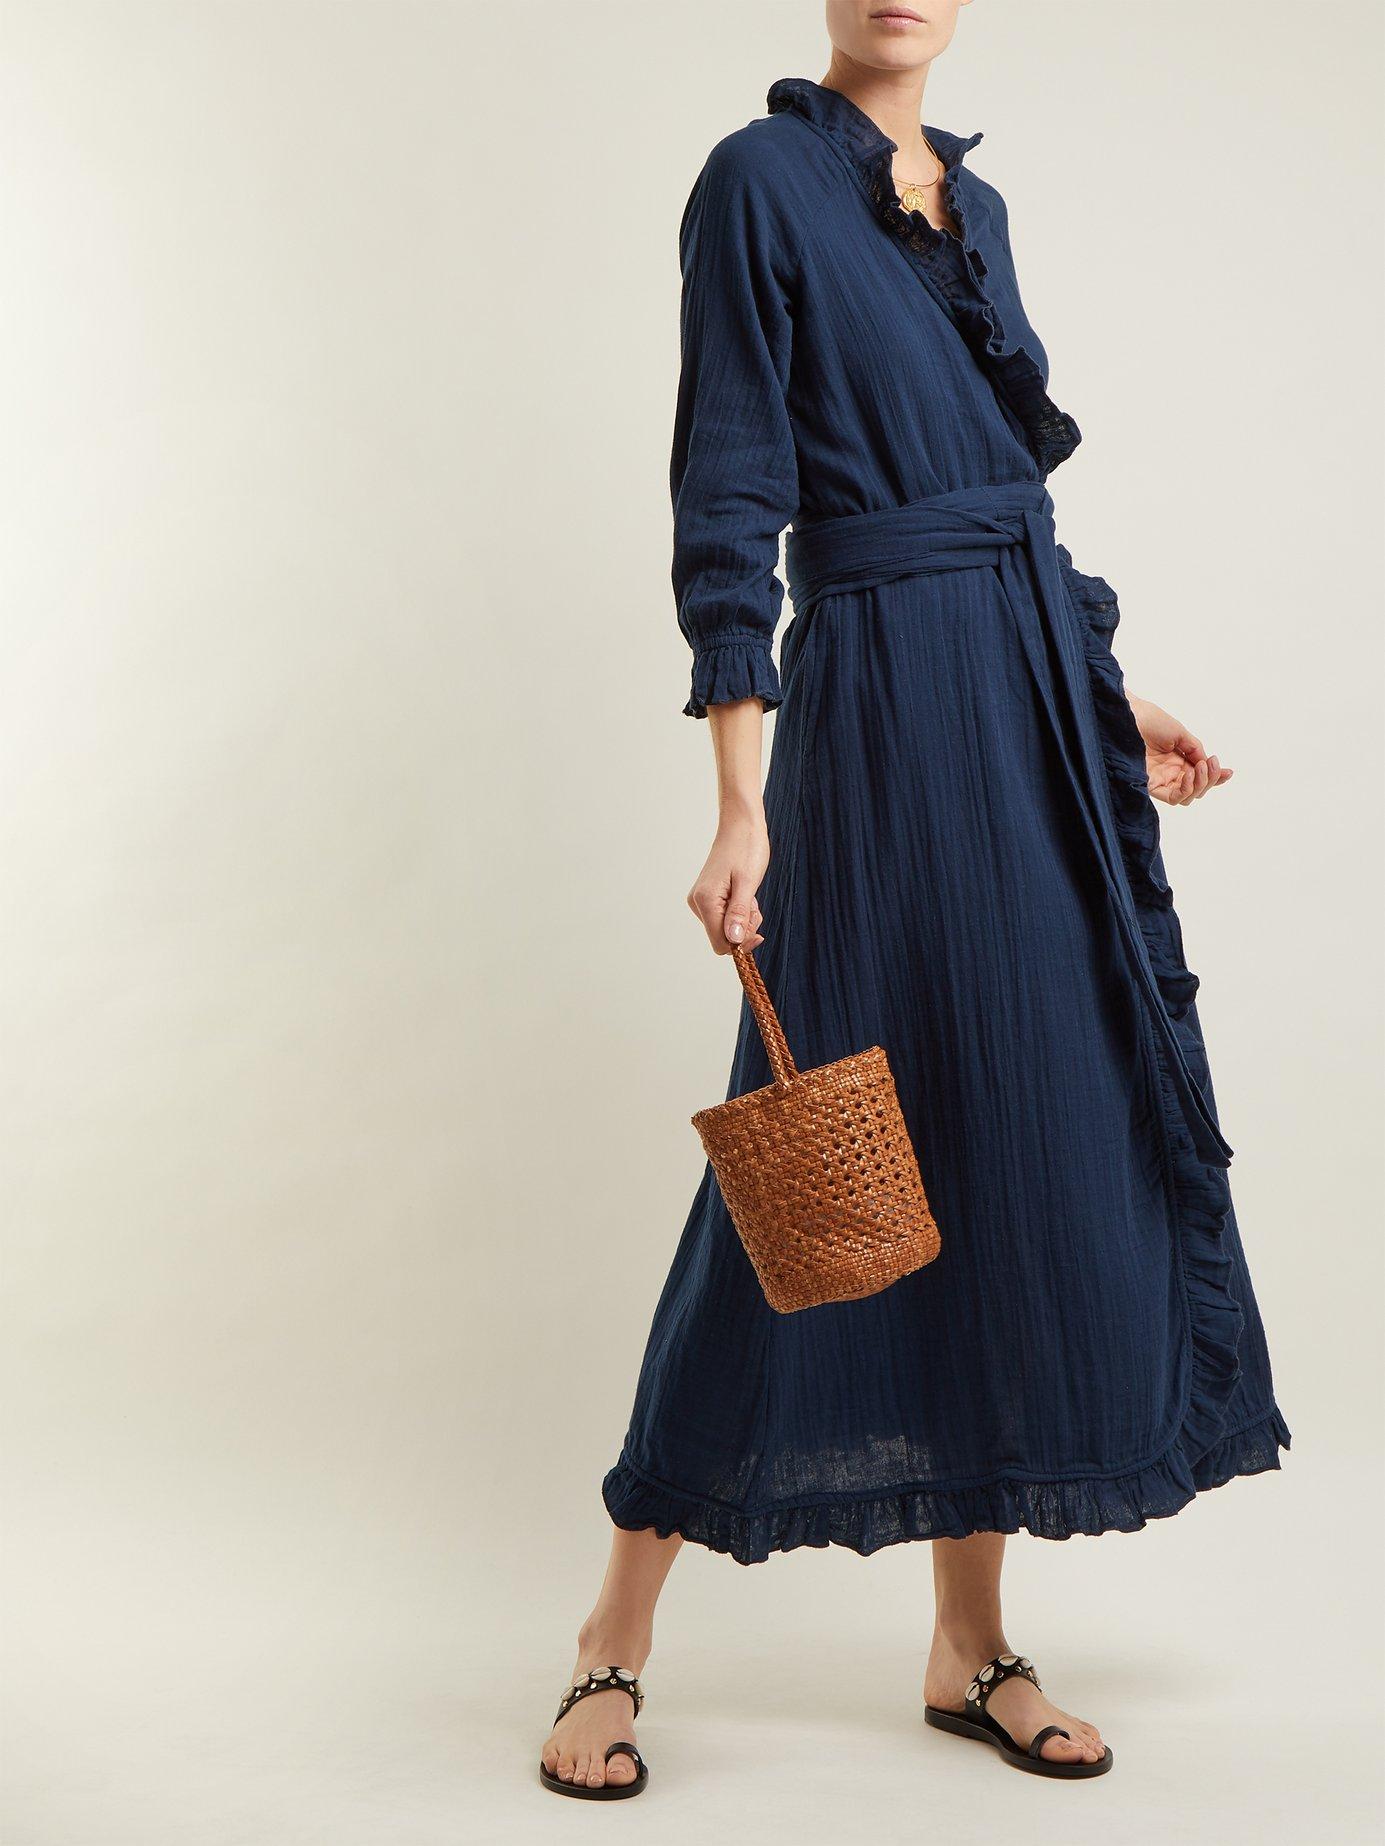 Jagger ruffle-trimmed cotton wrap dress by Rhode Resort